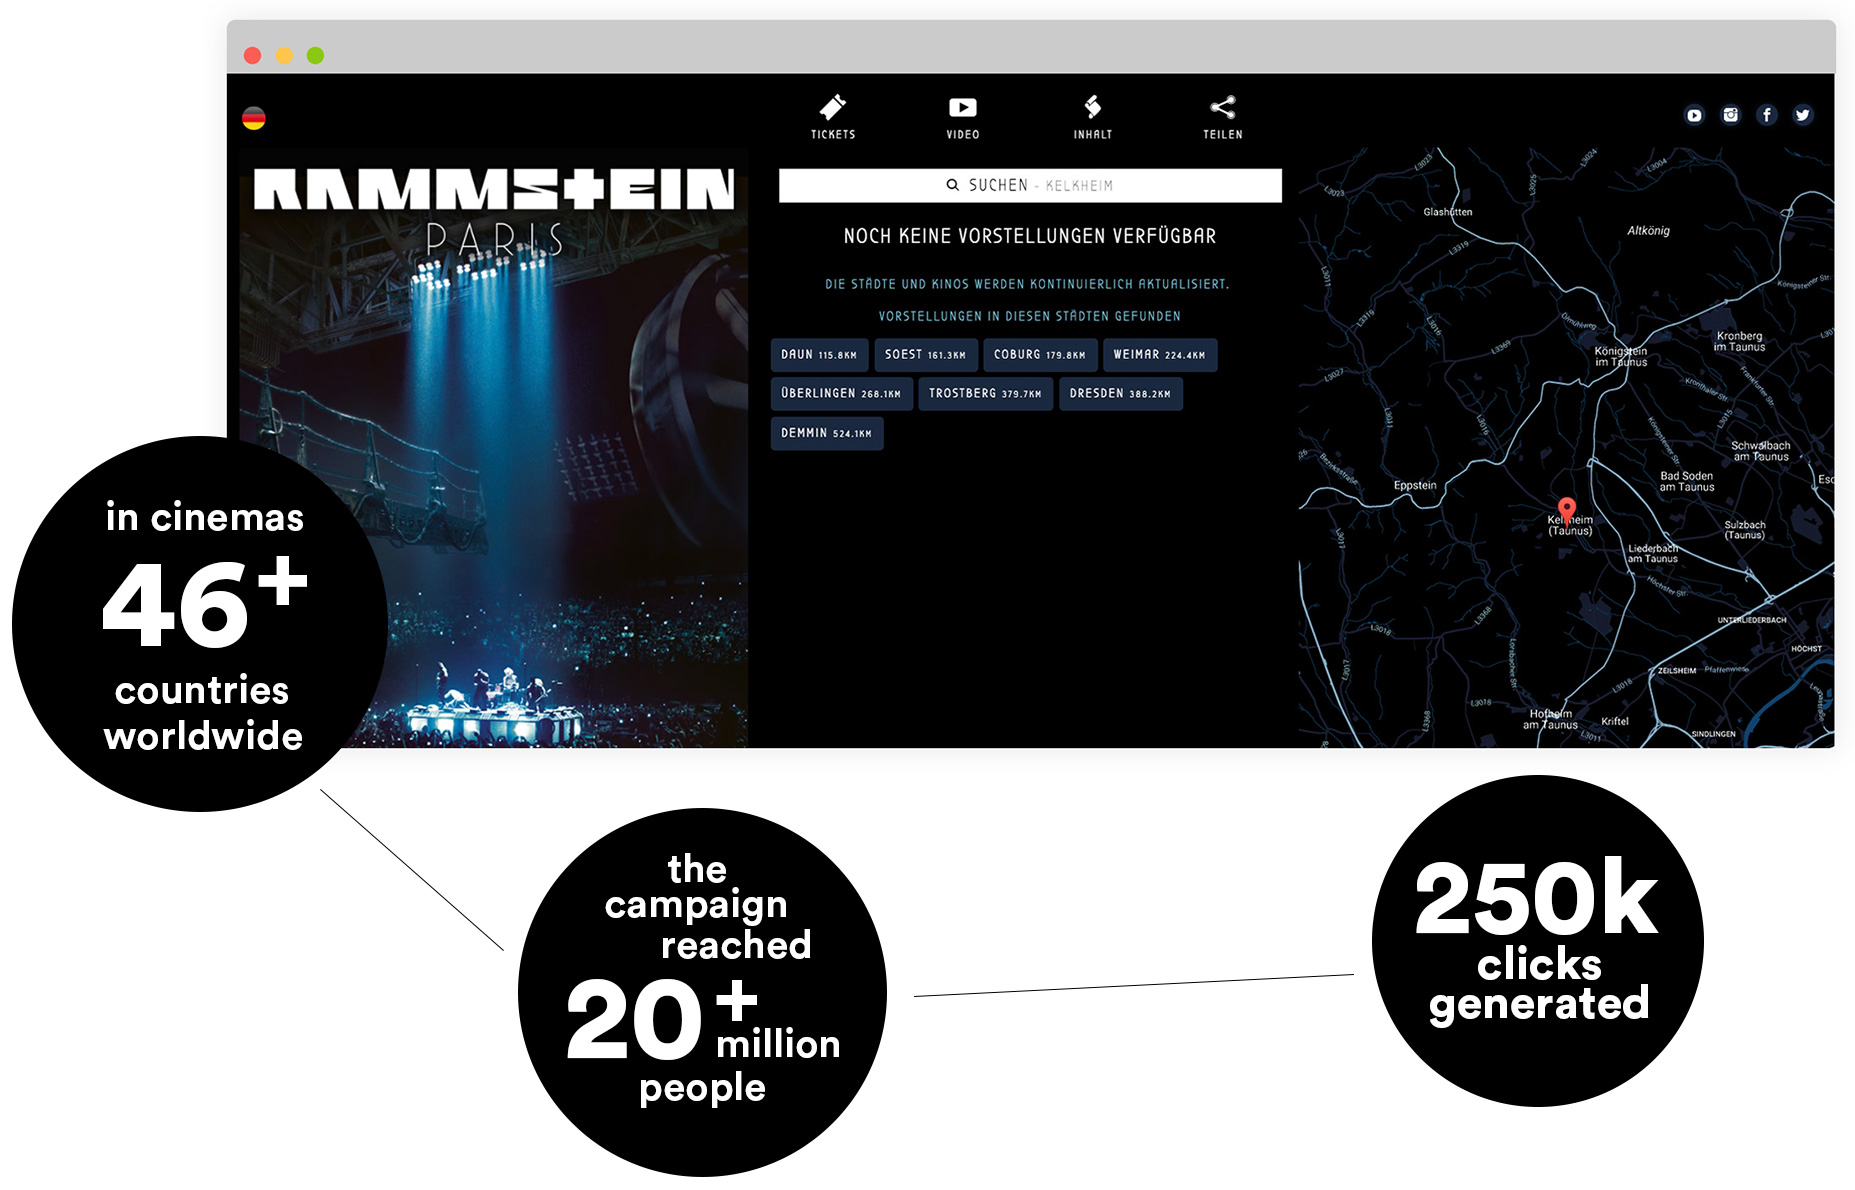 Ease Agency Online Marketing for Rammstein